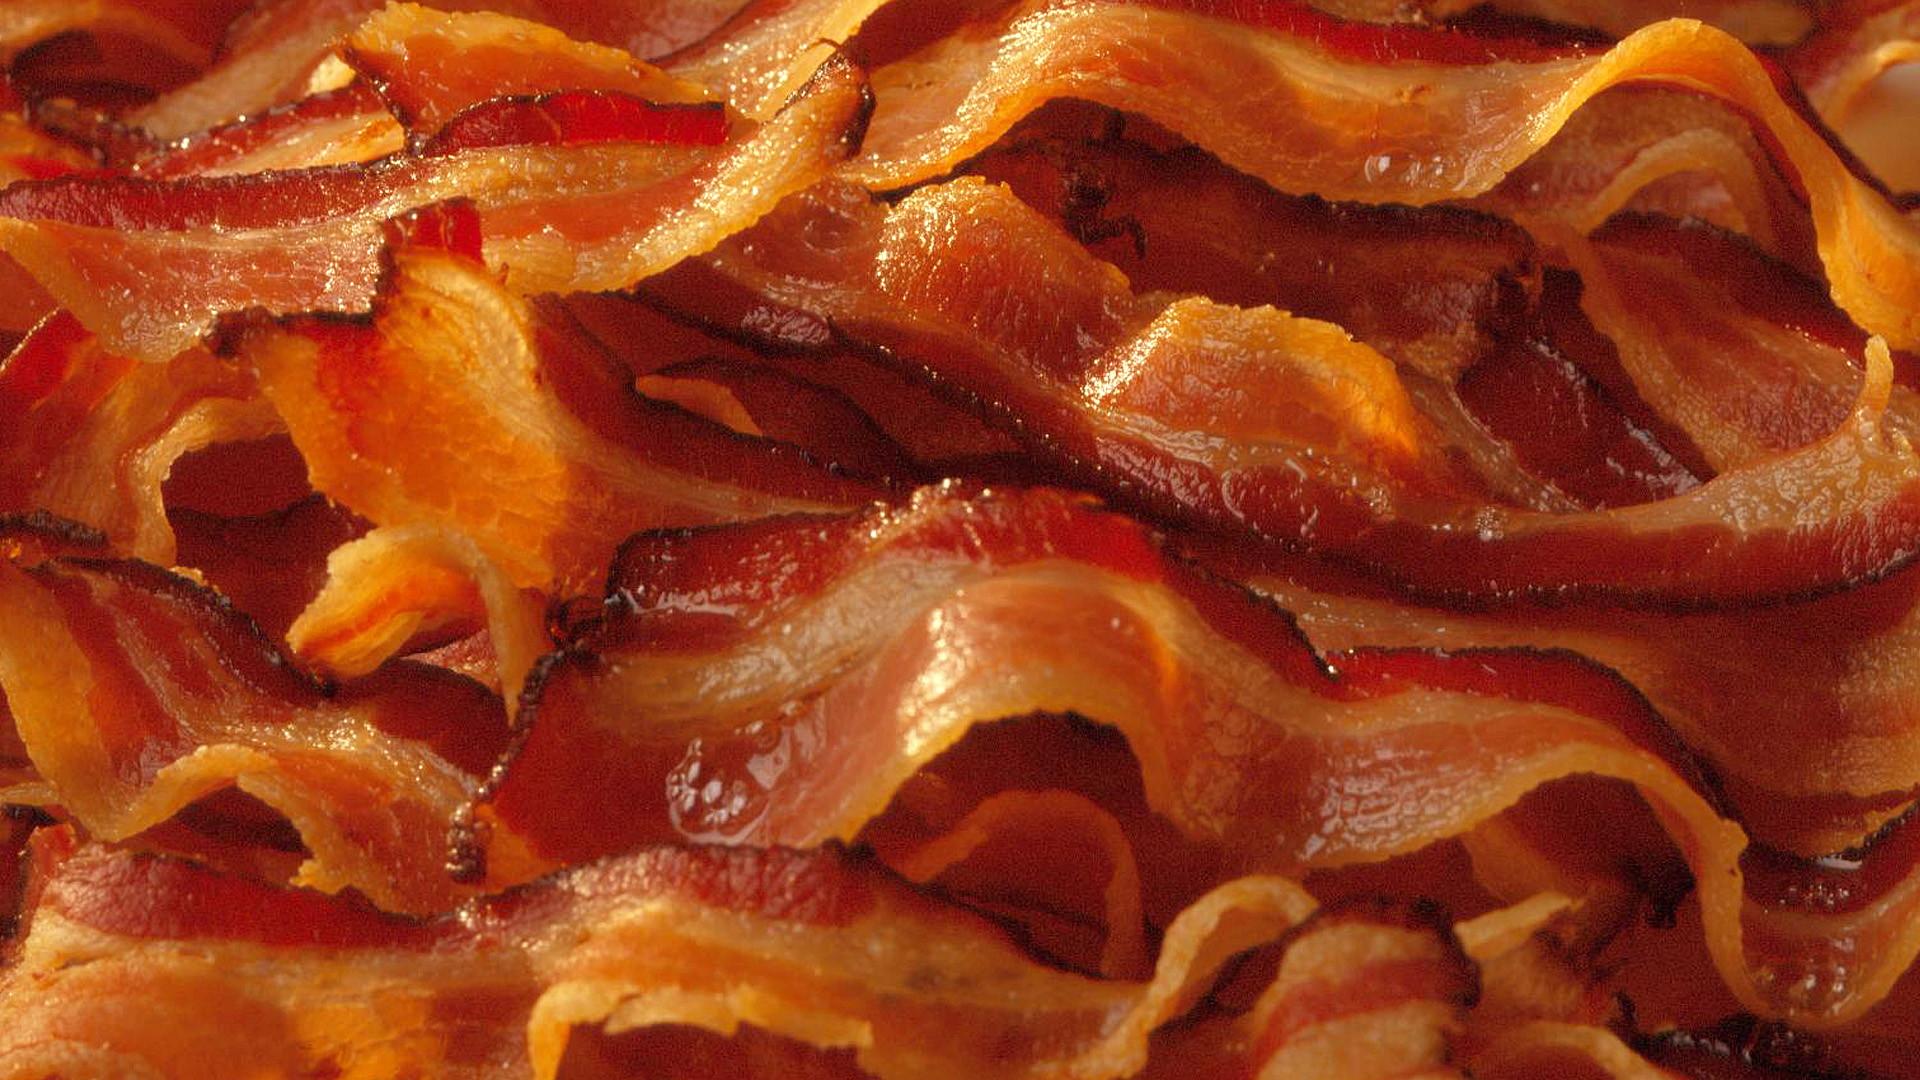 Sådan steger du perfekt bacon uden det krøller sammen